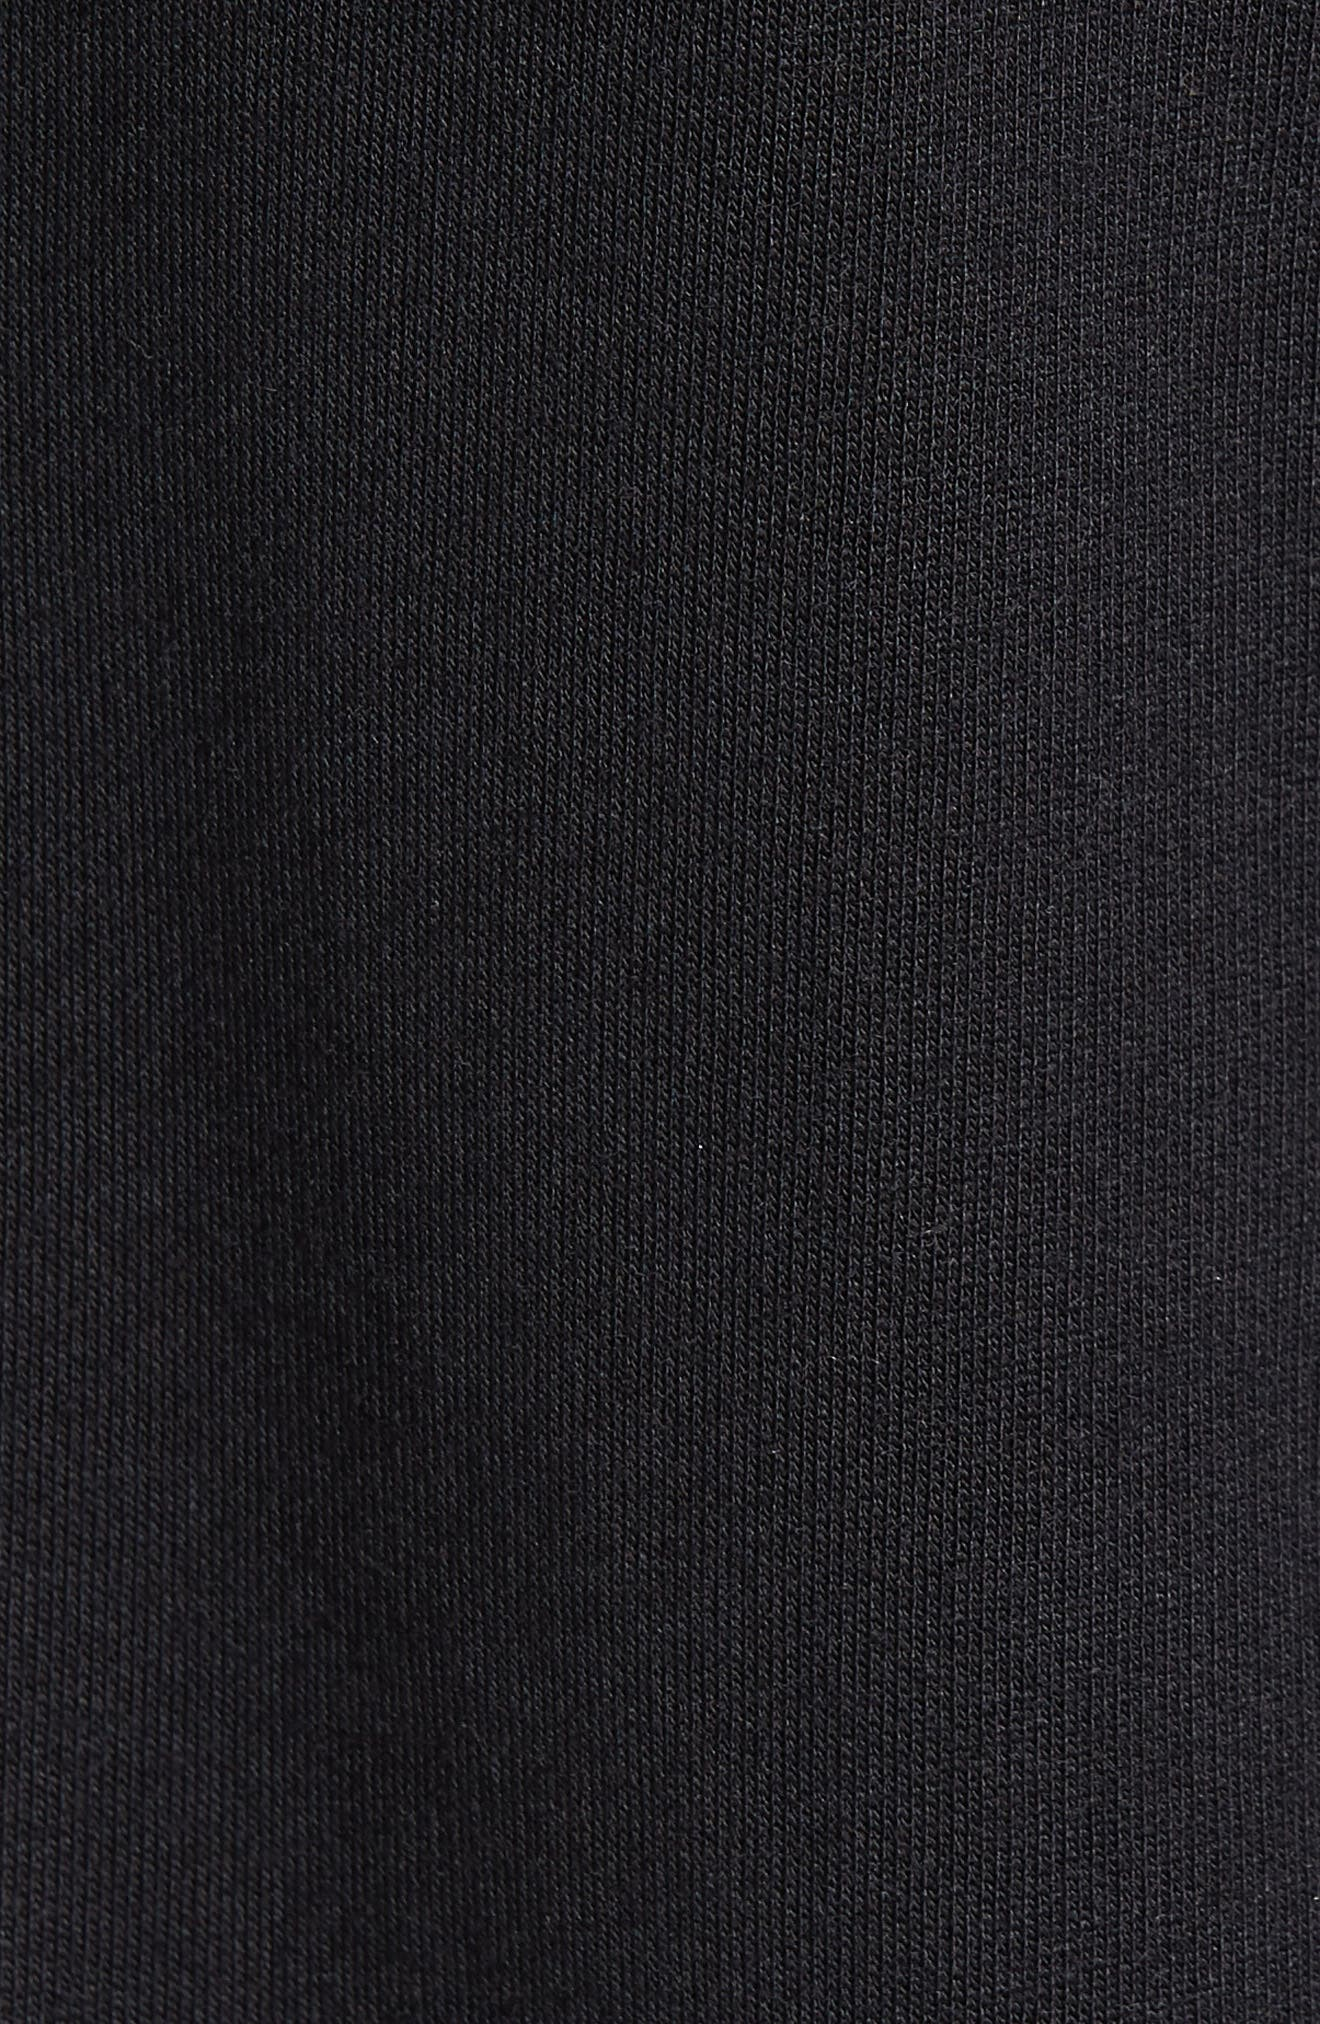 Reily Deep V-Neck Cotton Blend Tee,                             Alternate thumbnail 5, color,                             BLACK